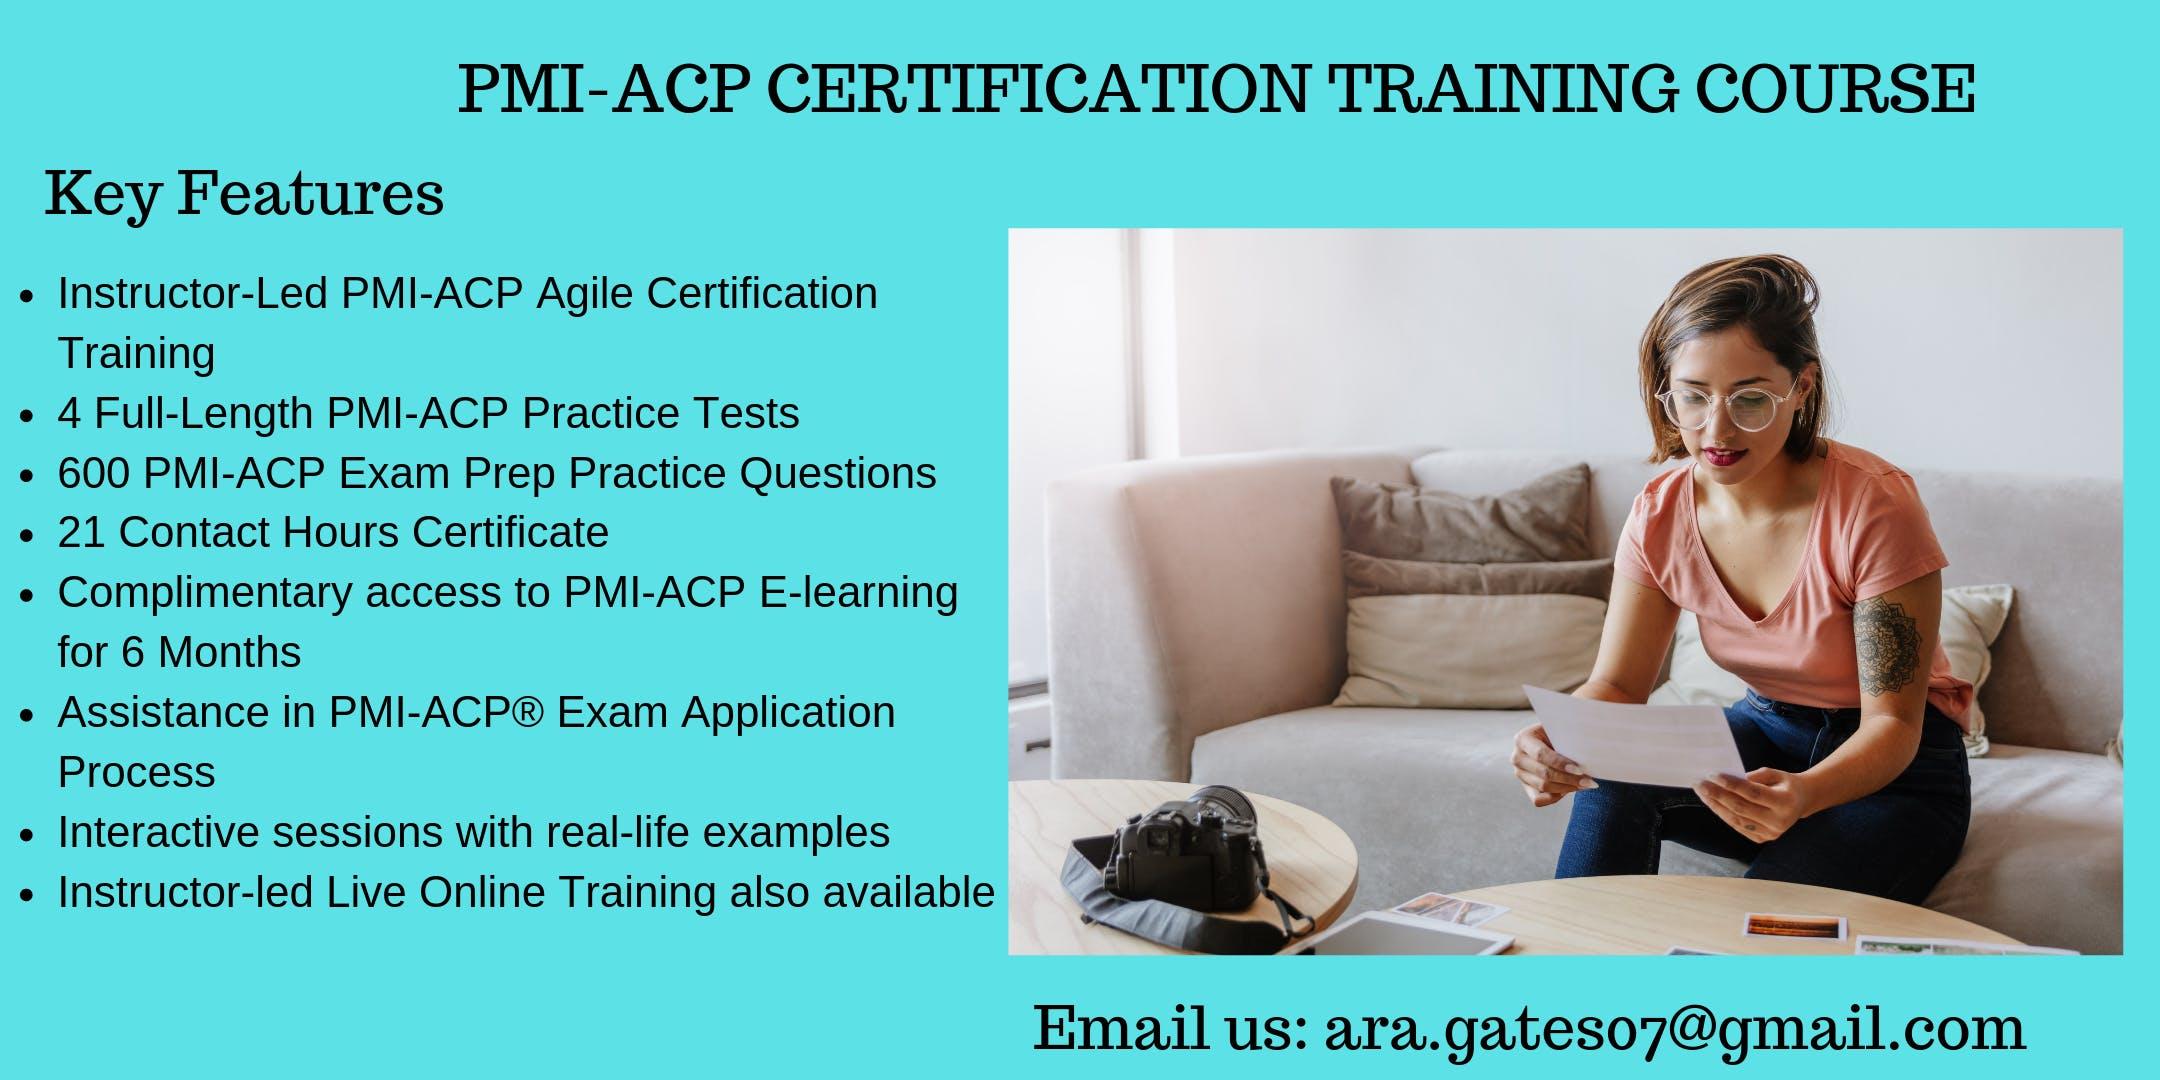 PMI-ACP Exam Prep Course in Halifax, NS